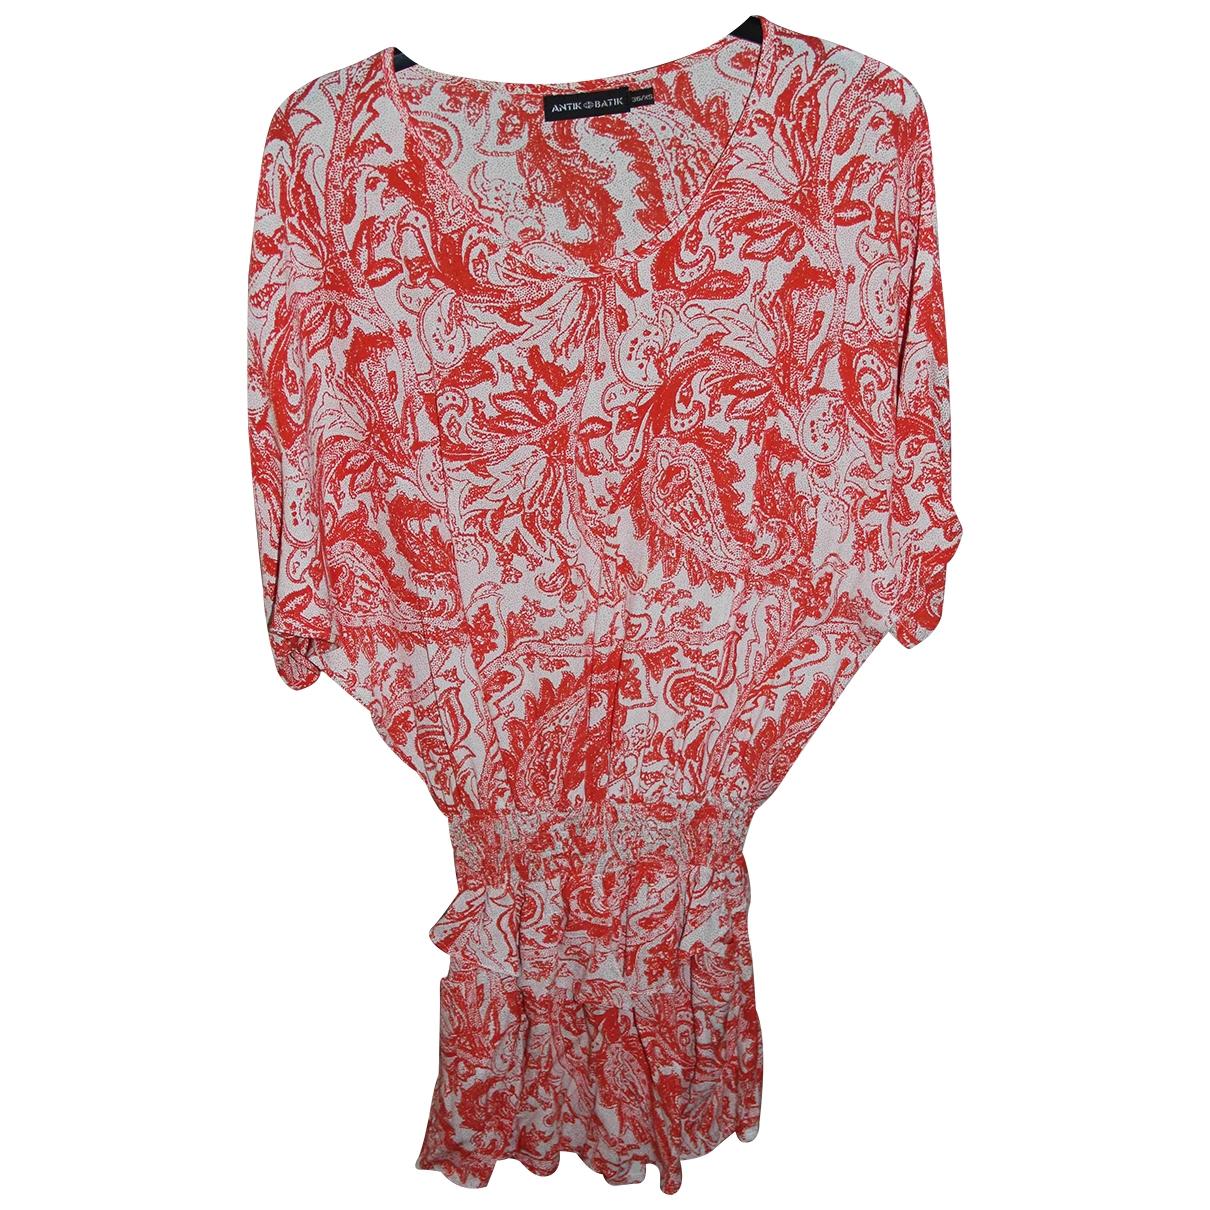 Antik Batik \N Red dress for Women 36 FR